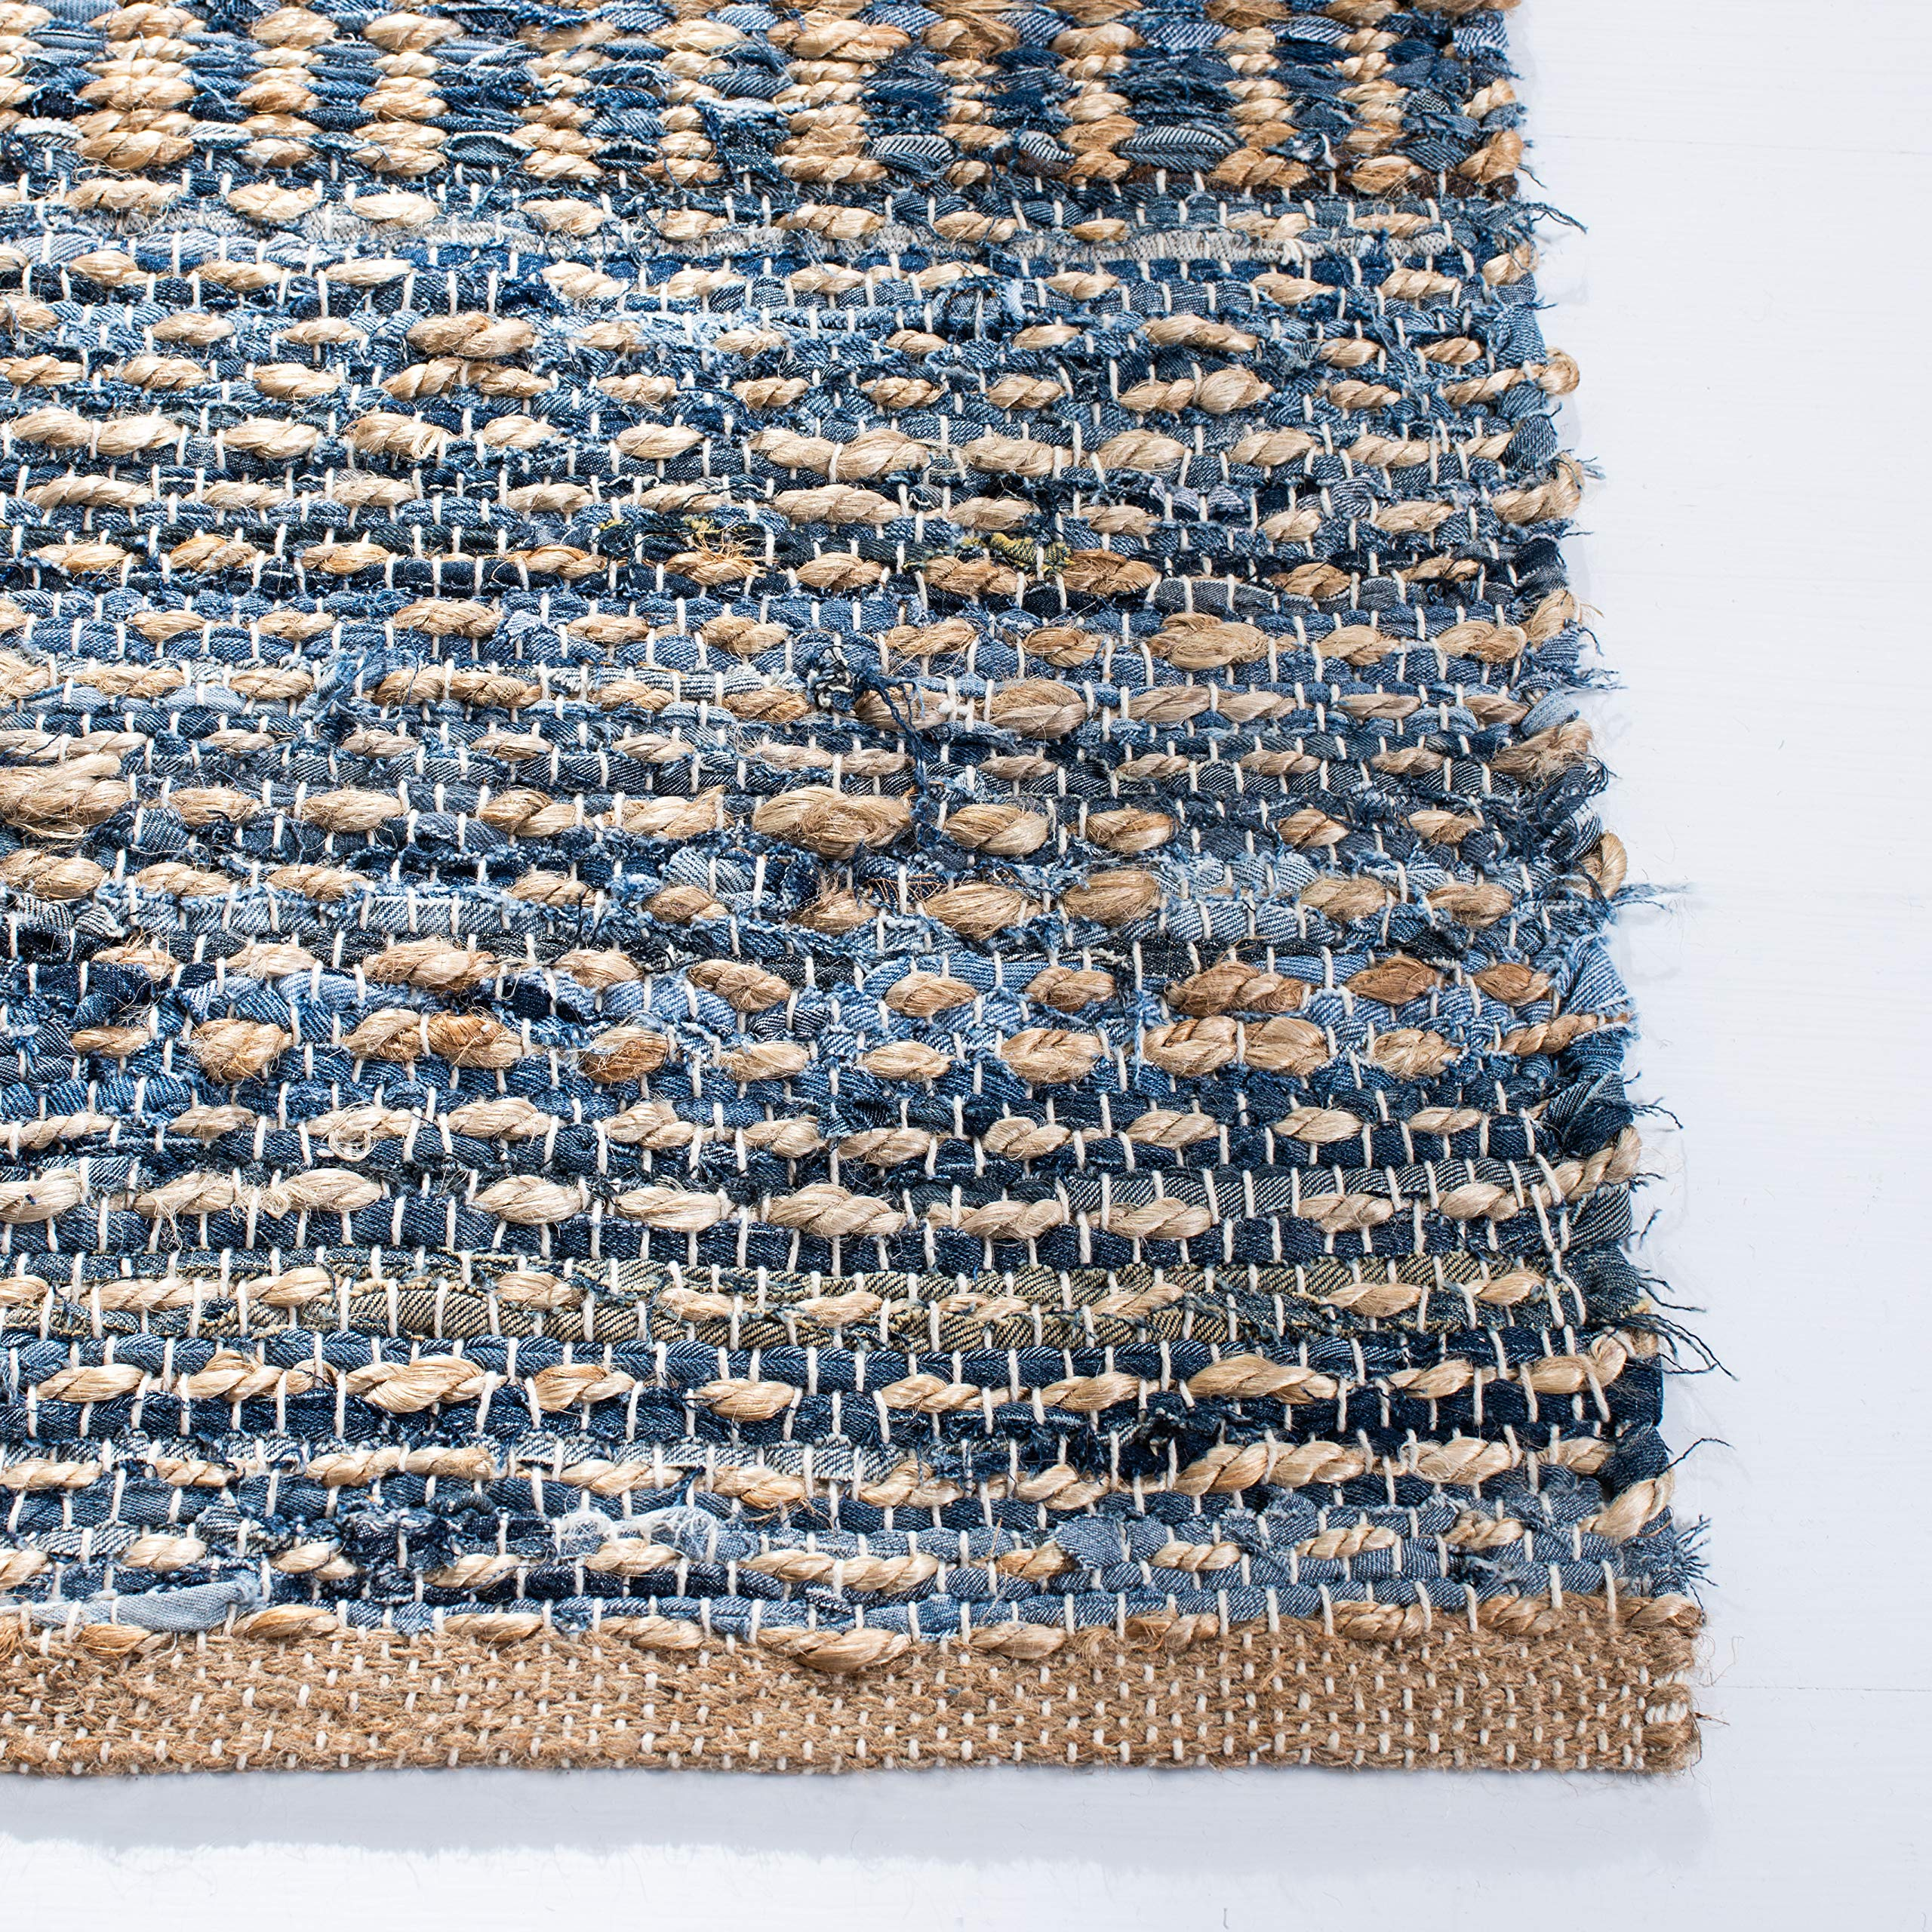 Safavieh Cape Cod Collection CAP353A Handmade Flatweave Coastal Braided Jute Area Rug, 3' x 5', Natural / Blue